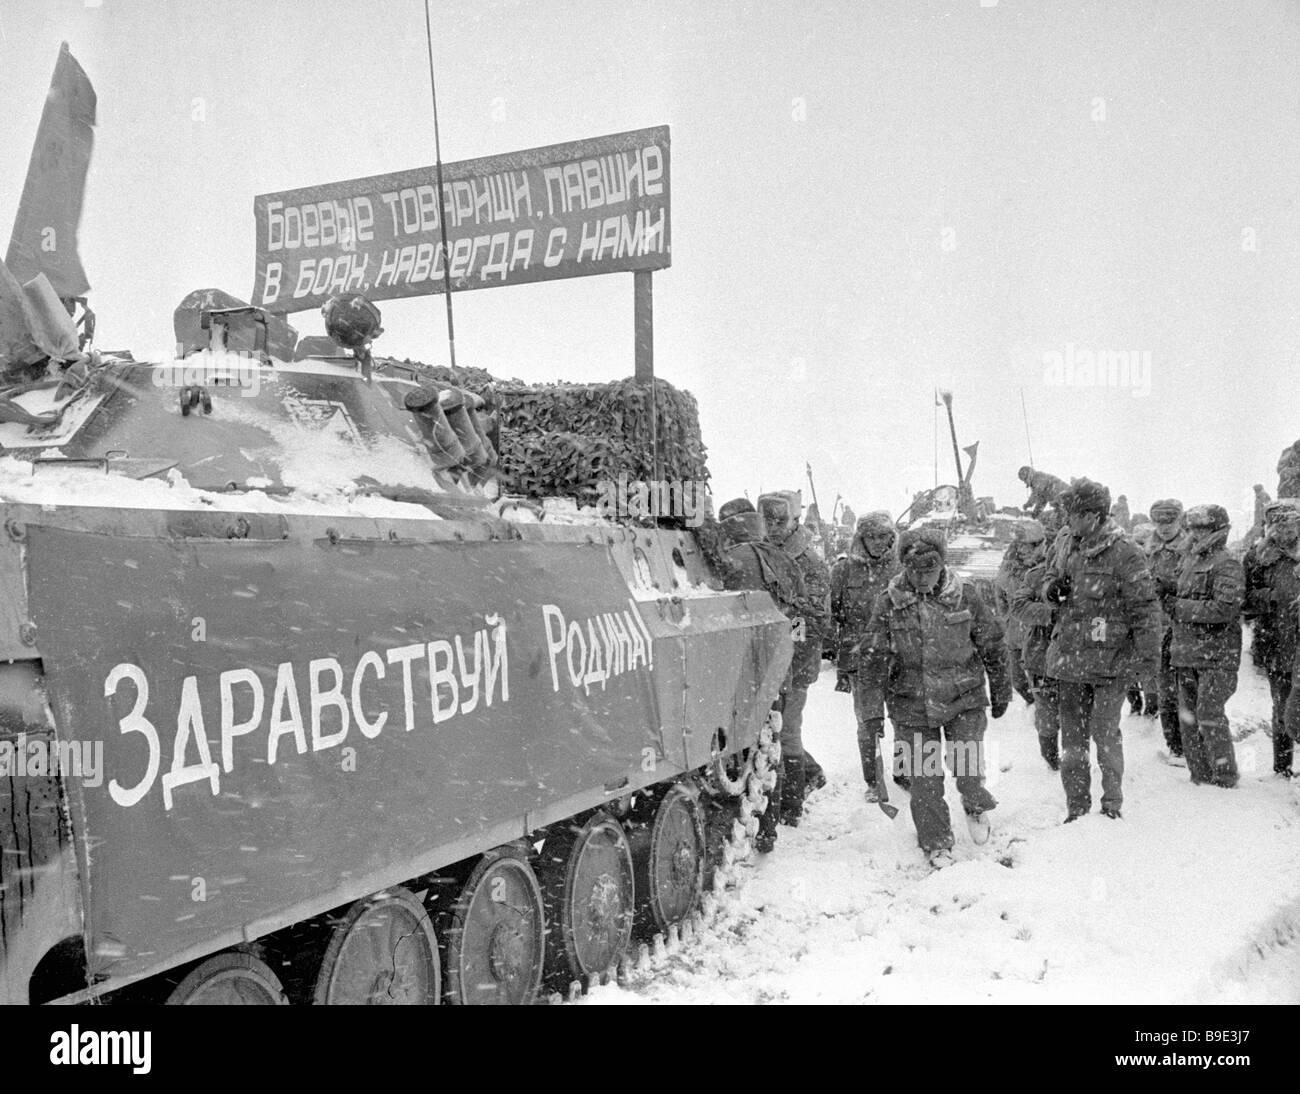 Soviet Afghanistan war - Page 6 Kushka-inhabitants-meet-soldiers-internationalists-returning-home-B9E3J7